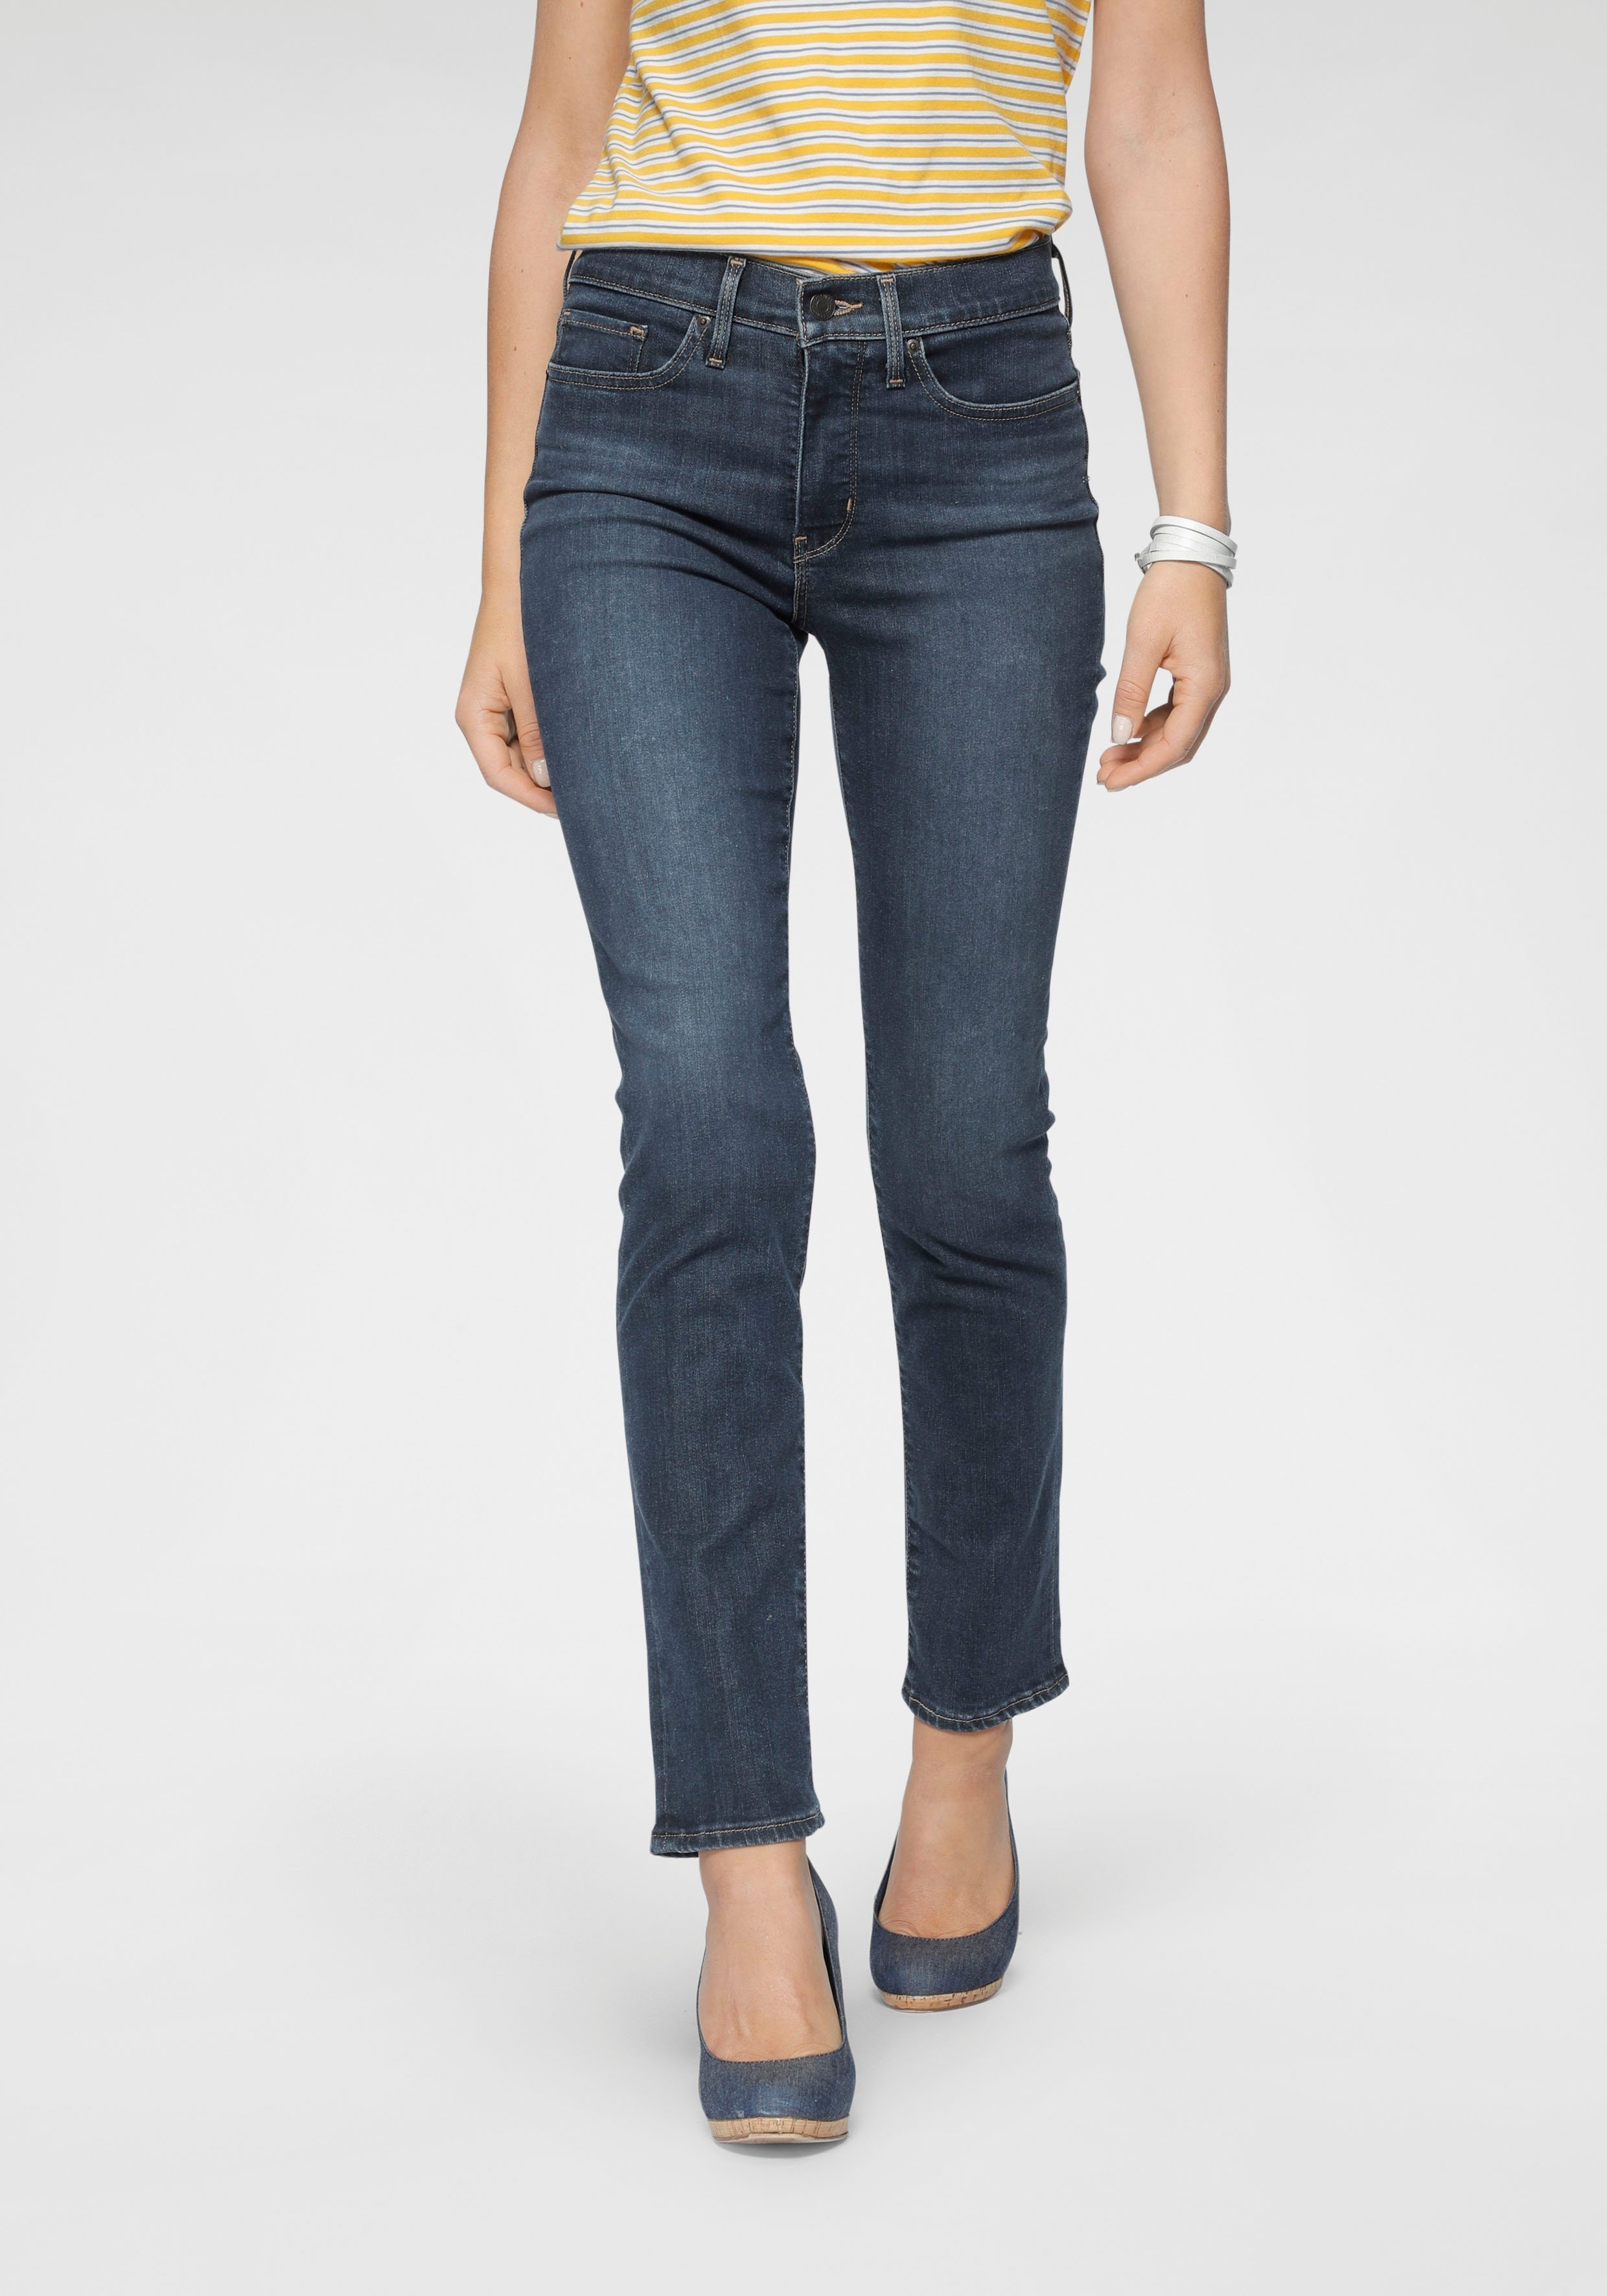 Levi's skinny jeans 312 Shaping Slim Smal shaping slim model voordelig en veilig online kopen